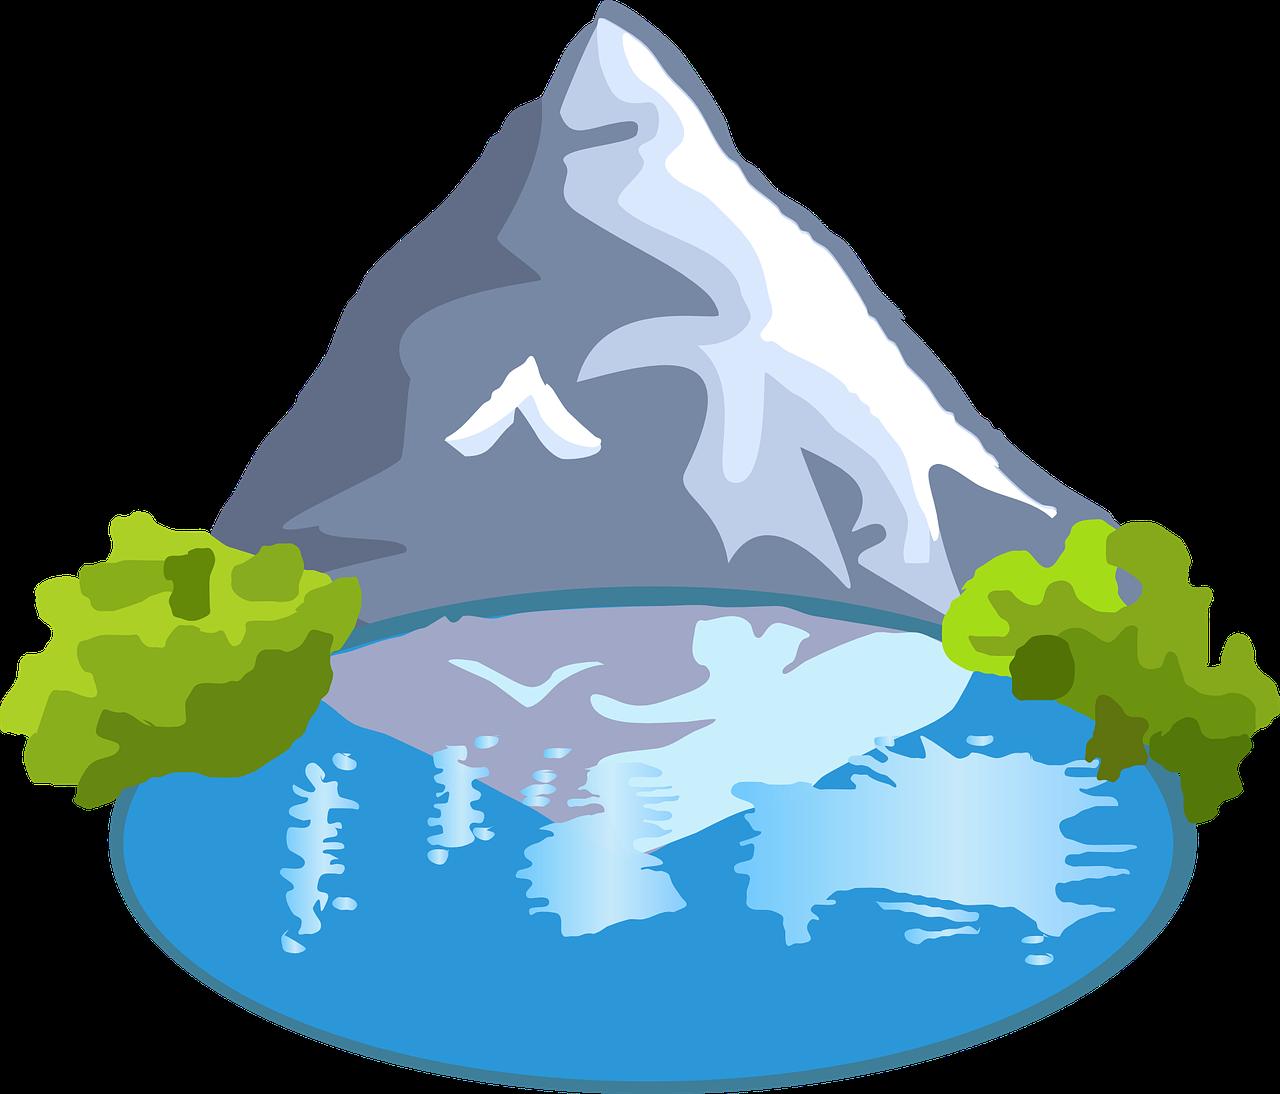 Lake clipart #7, Download drawings